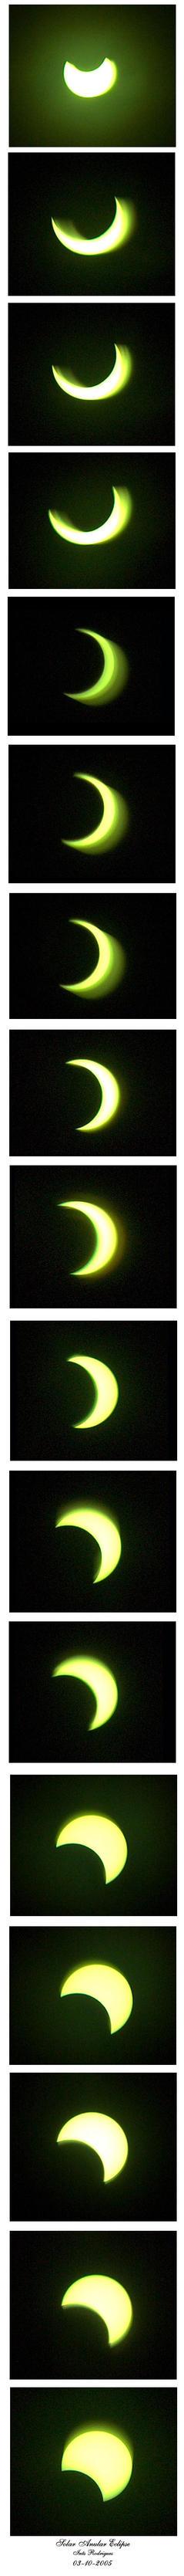 Partial Solar Anular Eclipse by Melanargia